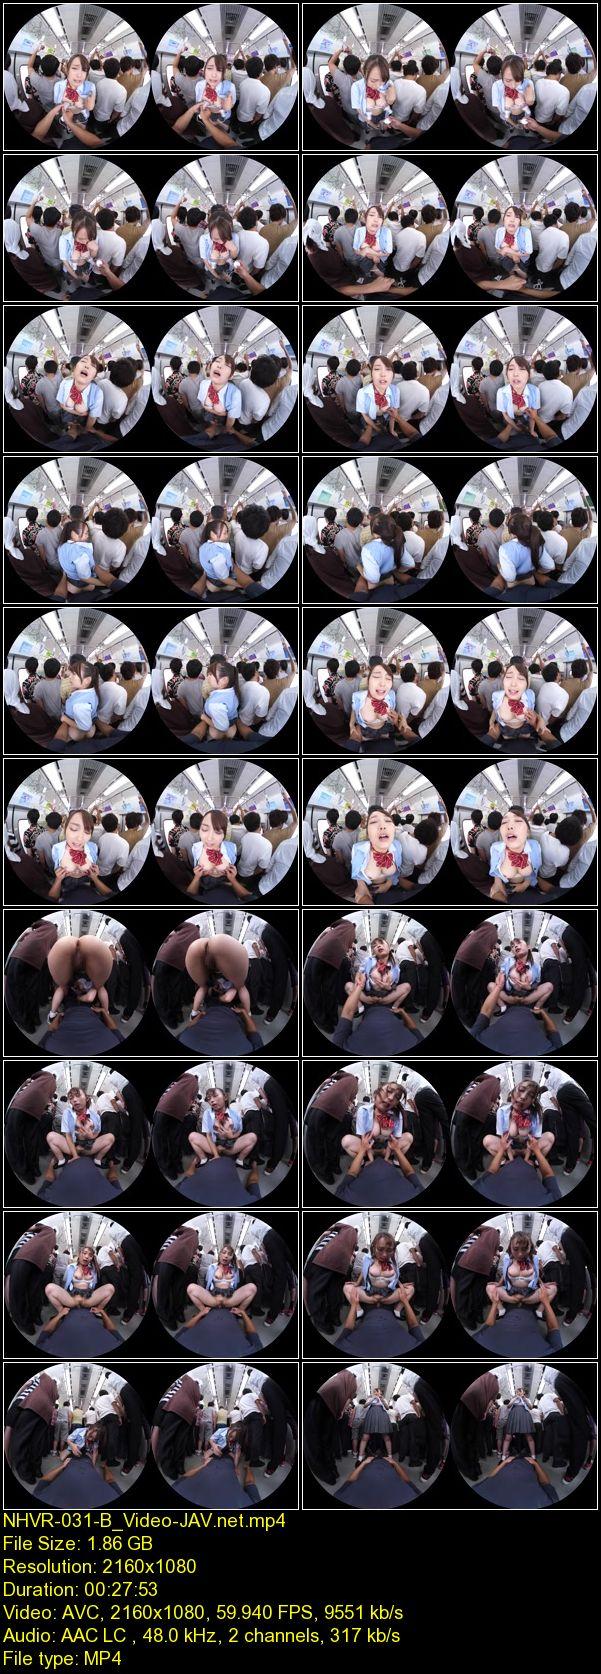 JAV Download [NHVR 031] 【VR AV】乳首いじり痴漢 VR ~コリコリ刺激され続け発情する敏感女~ 2019 01 25